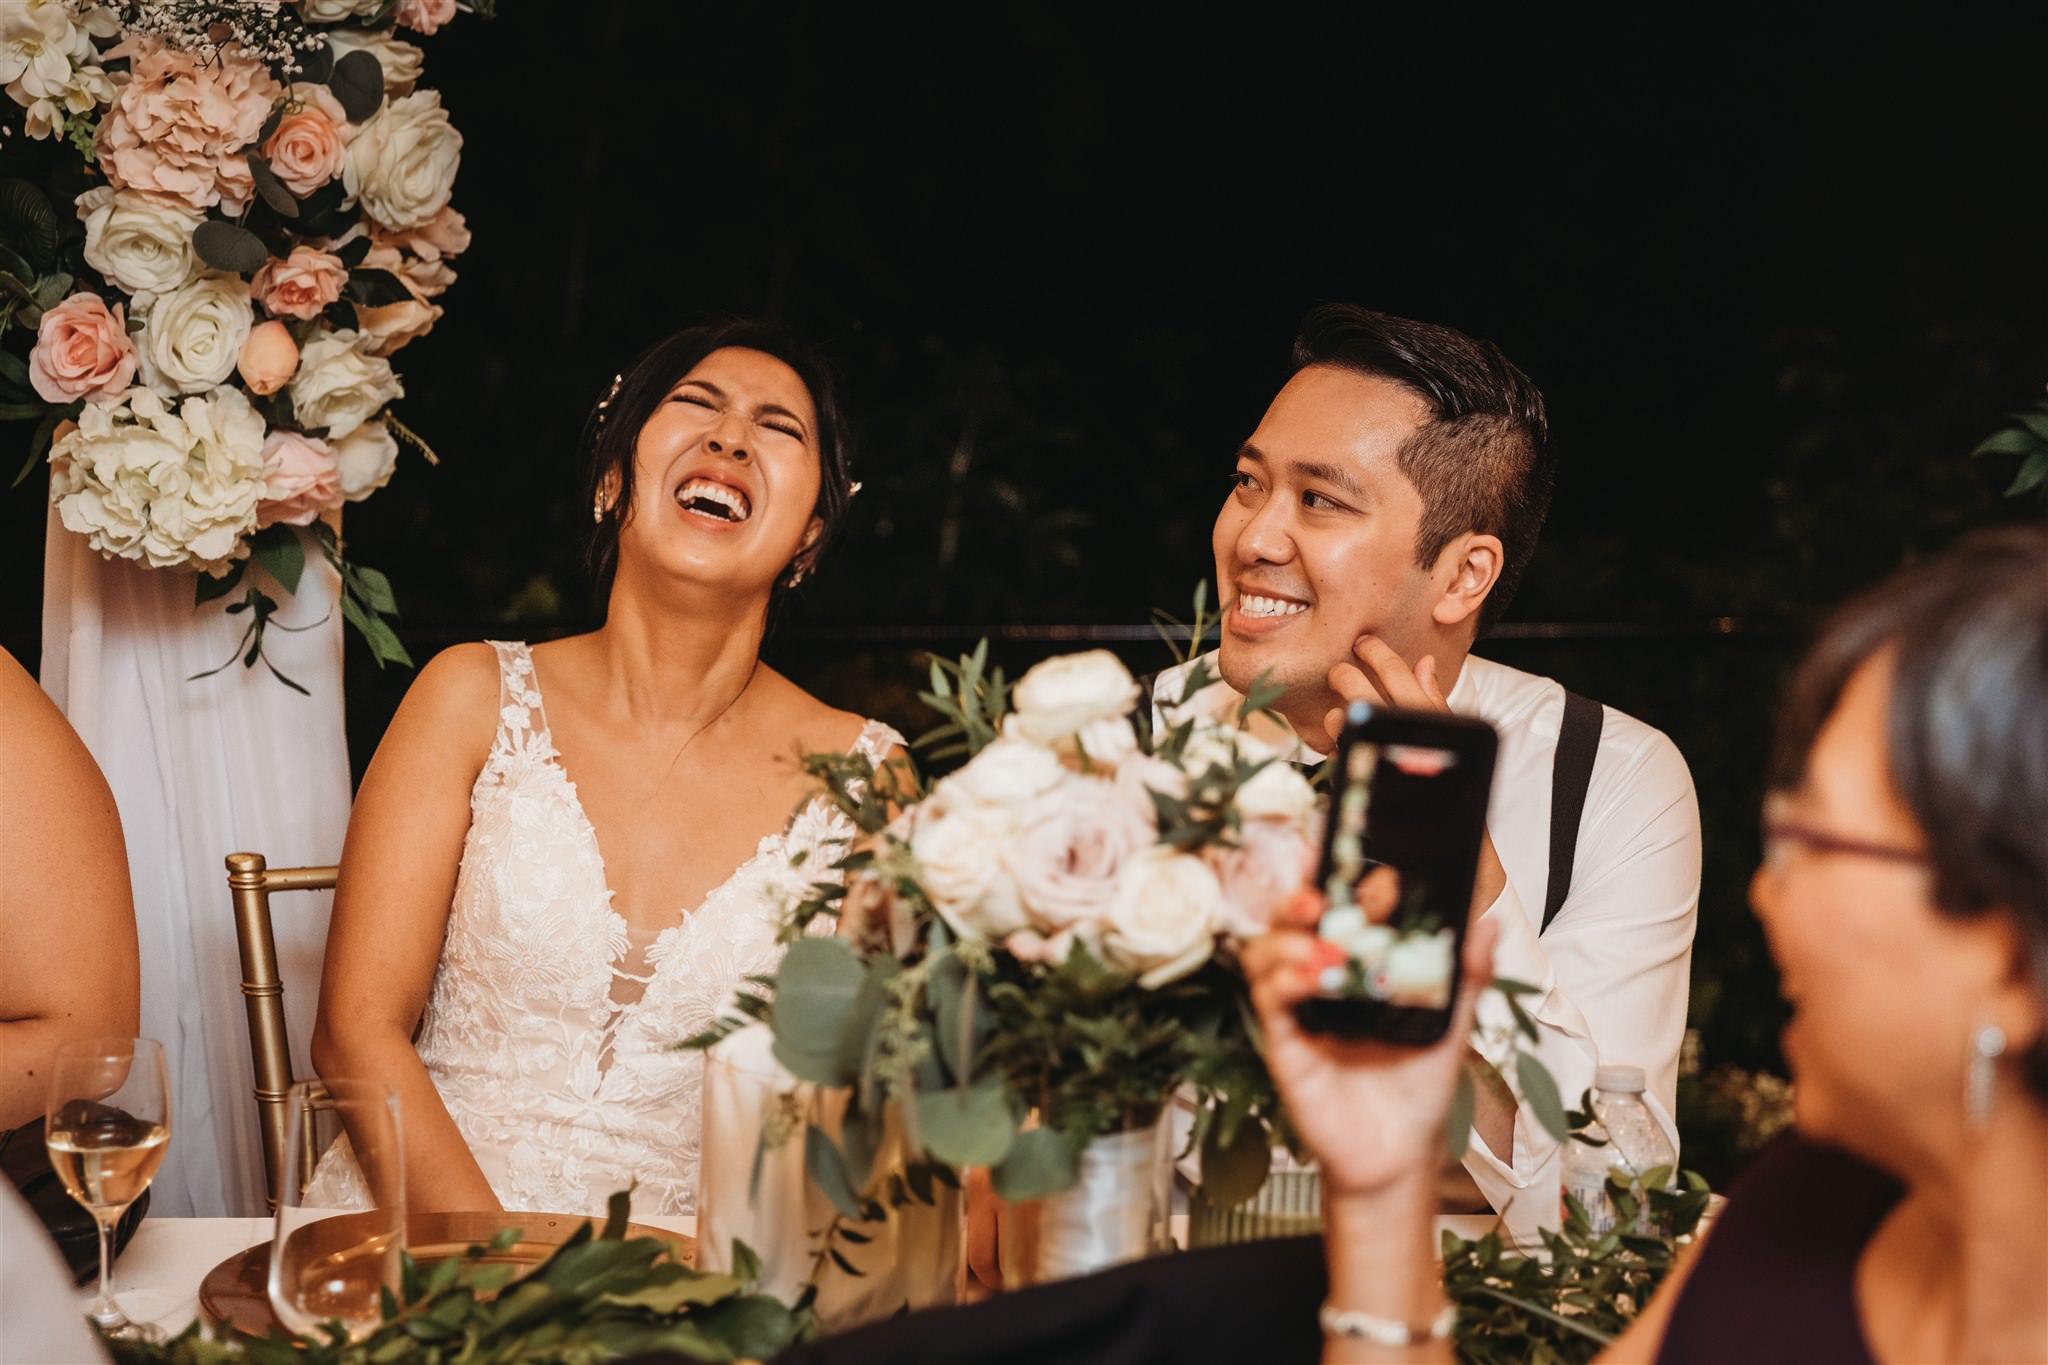 Rainy Day Backyard Wedding, what to do if it rains on your wedding day